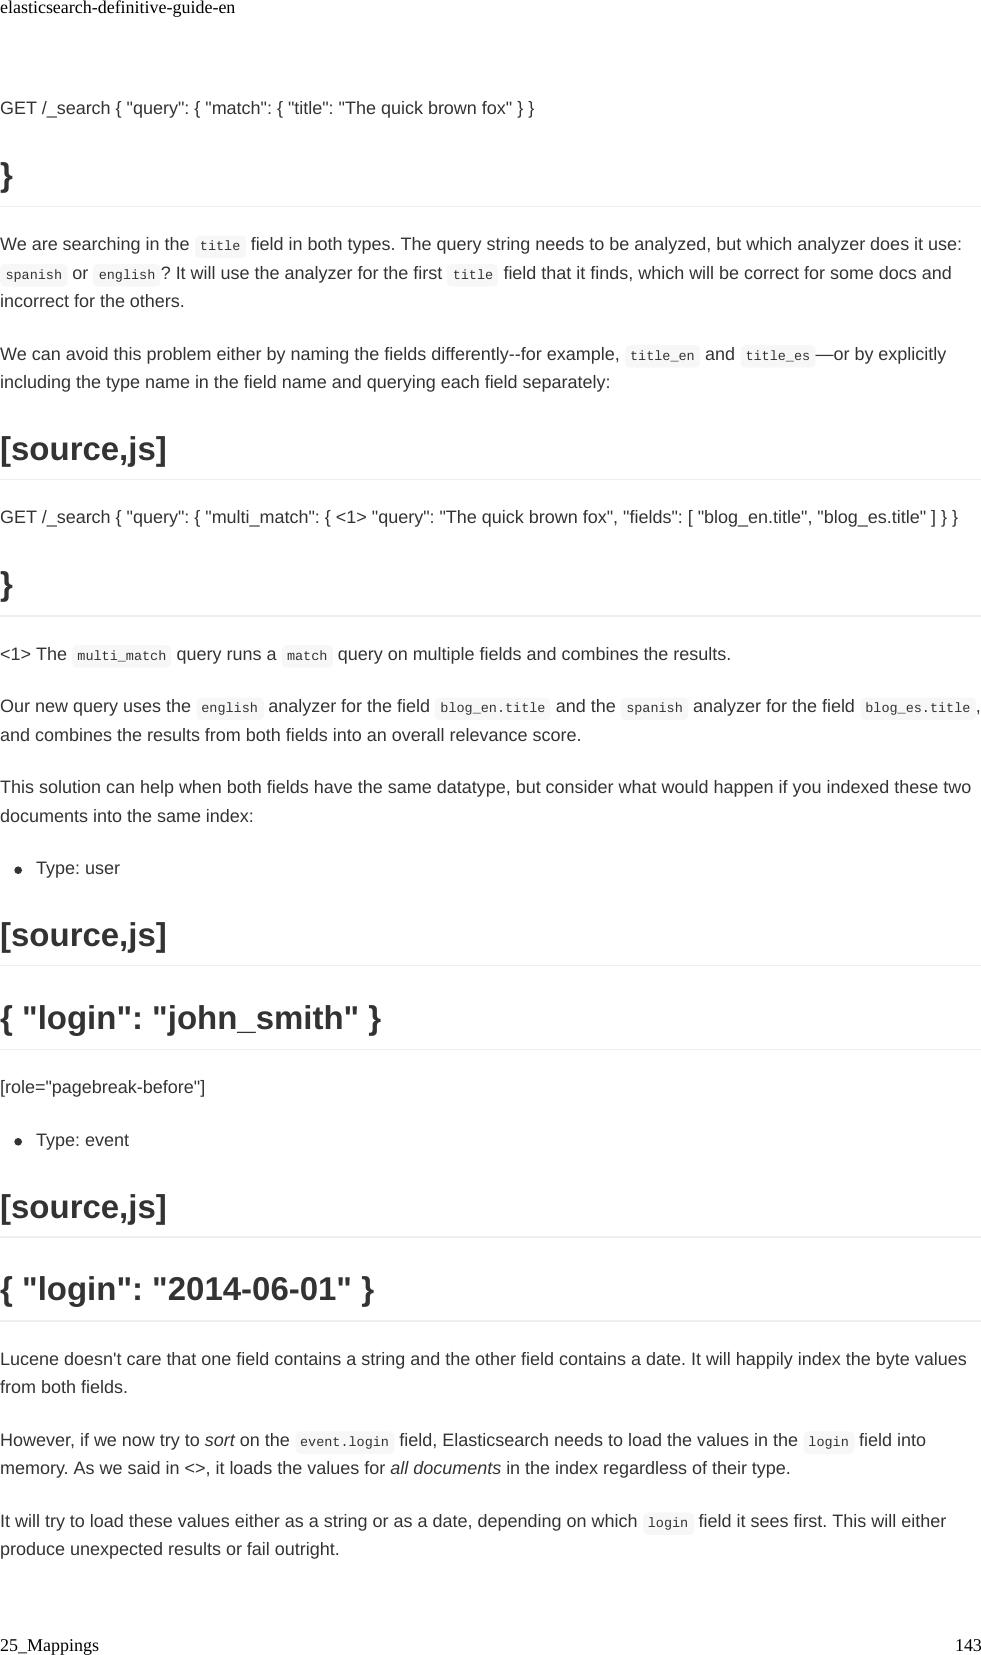 Elasticsearch definitive guide en